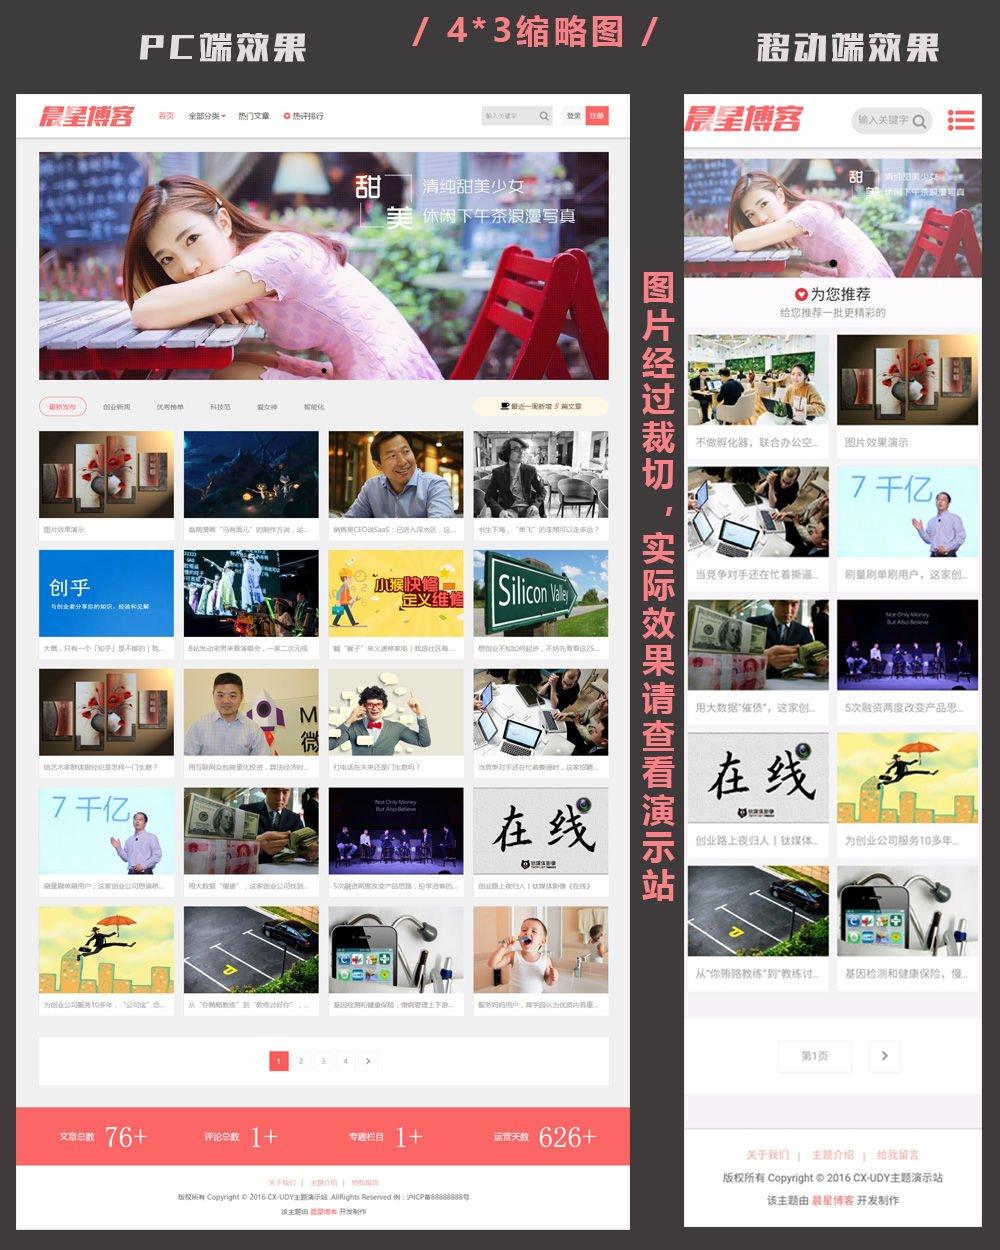 【CX-UDY3.1主题源码】 wordpress最新主题 美女图片虚拟资源付费查看与付费下载带在线充值与卡密系统网站模板去授权版